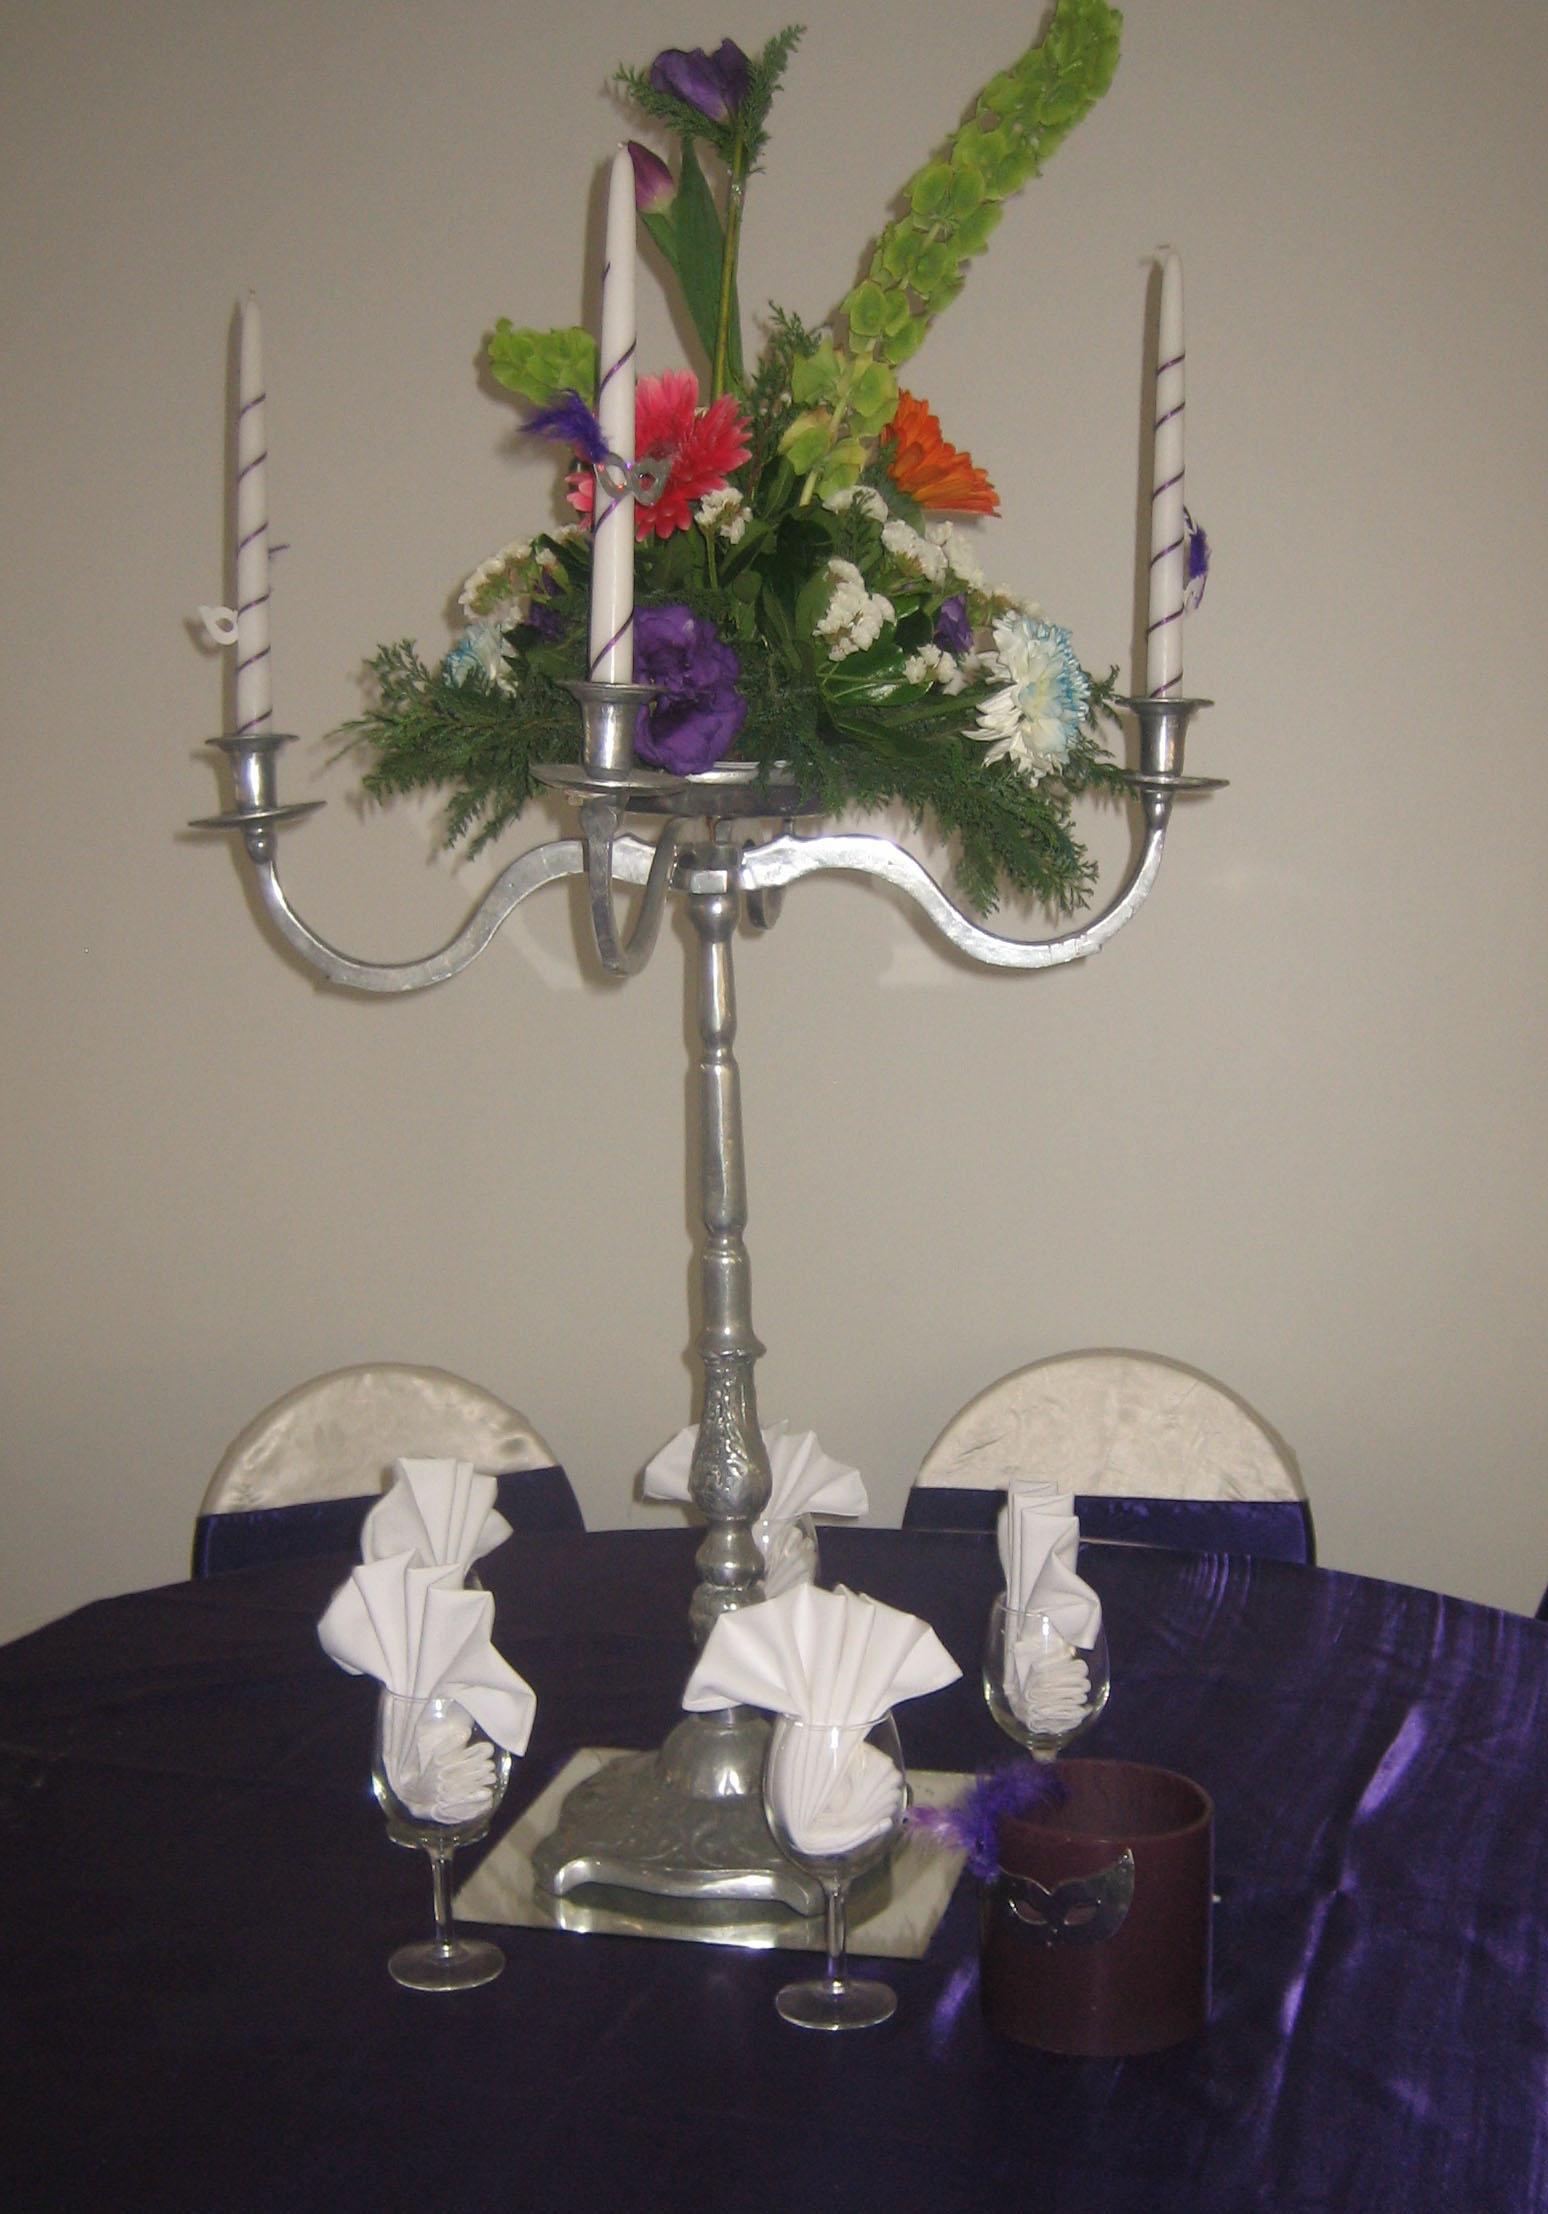 Centros de mesa con velas 1 la casa de la vela - La casa de las velas ...